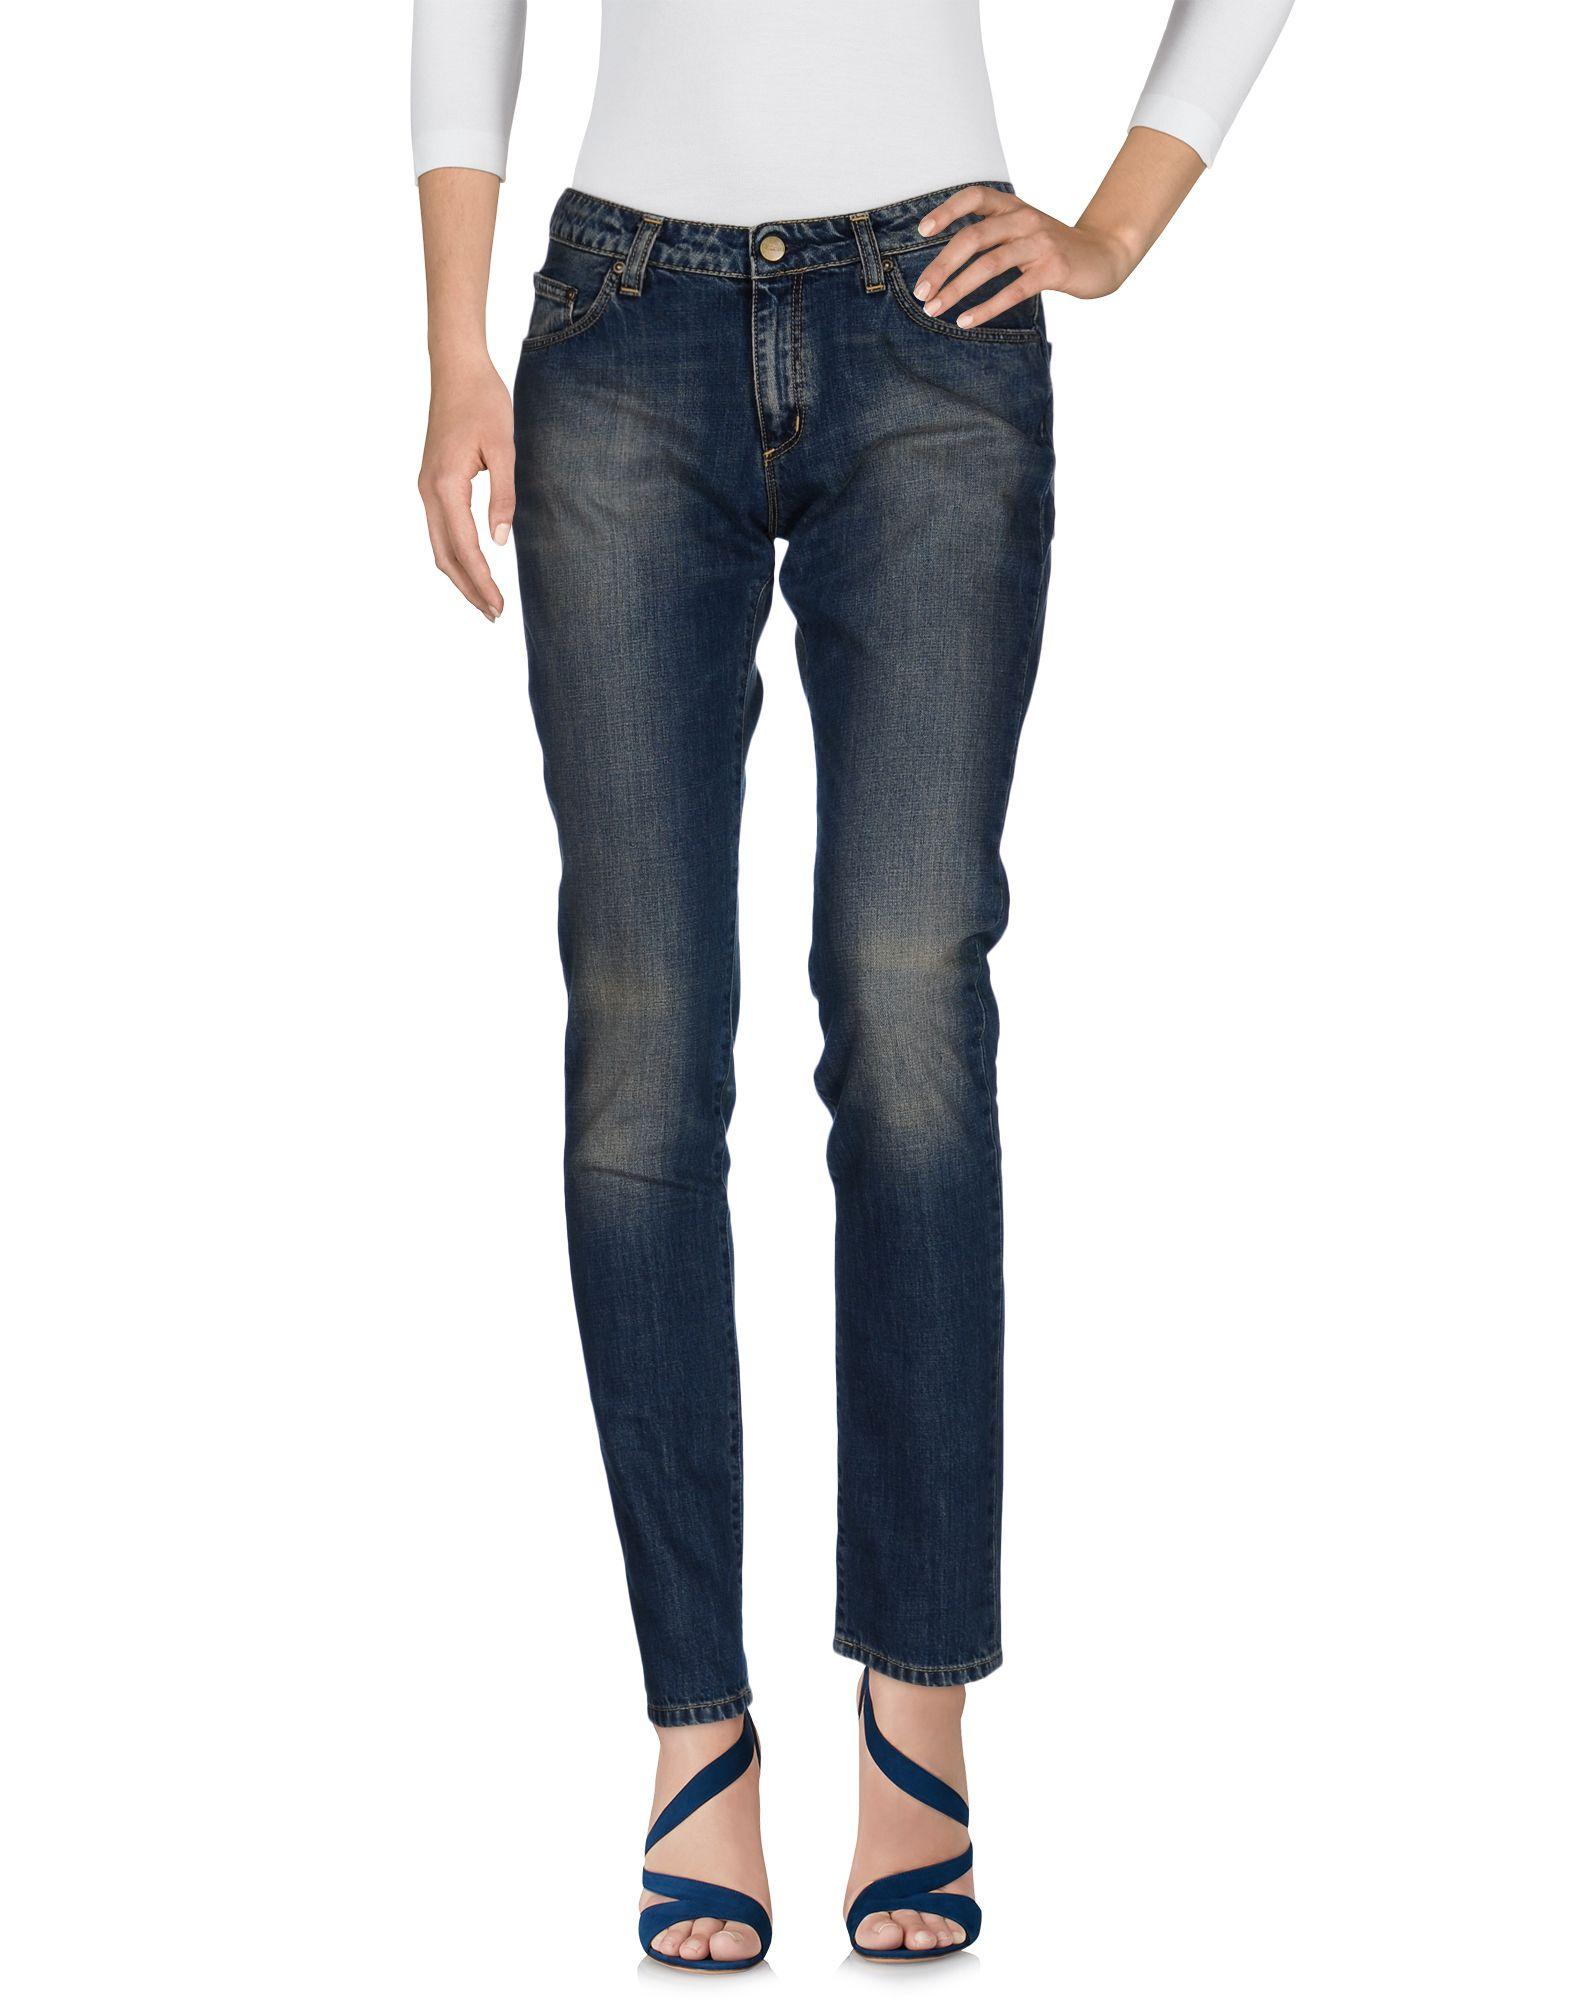 Pantalon en jean carhartt femme. bleu. 29w-32l...